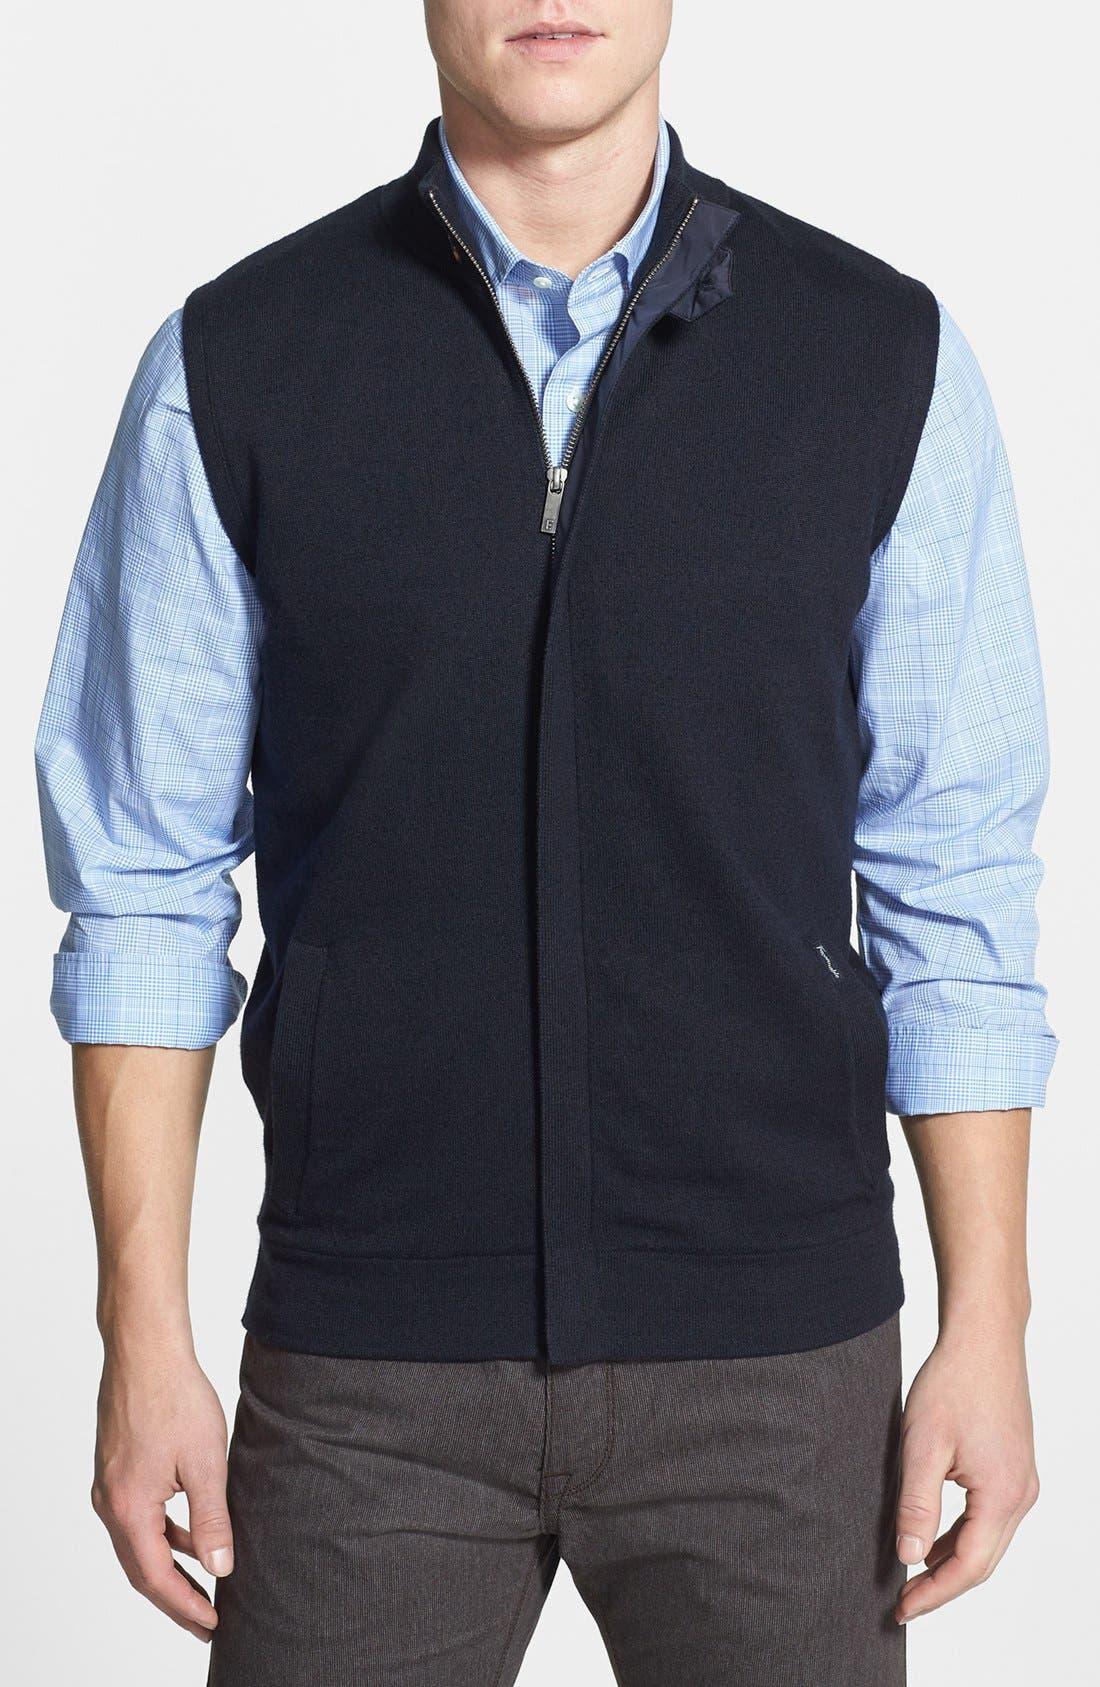 Main Image - Façonnable Sweater Wool & Cotton Vest